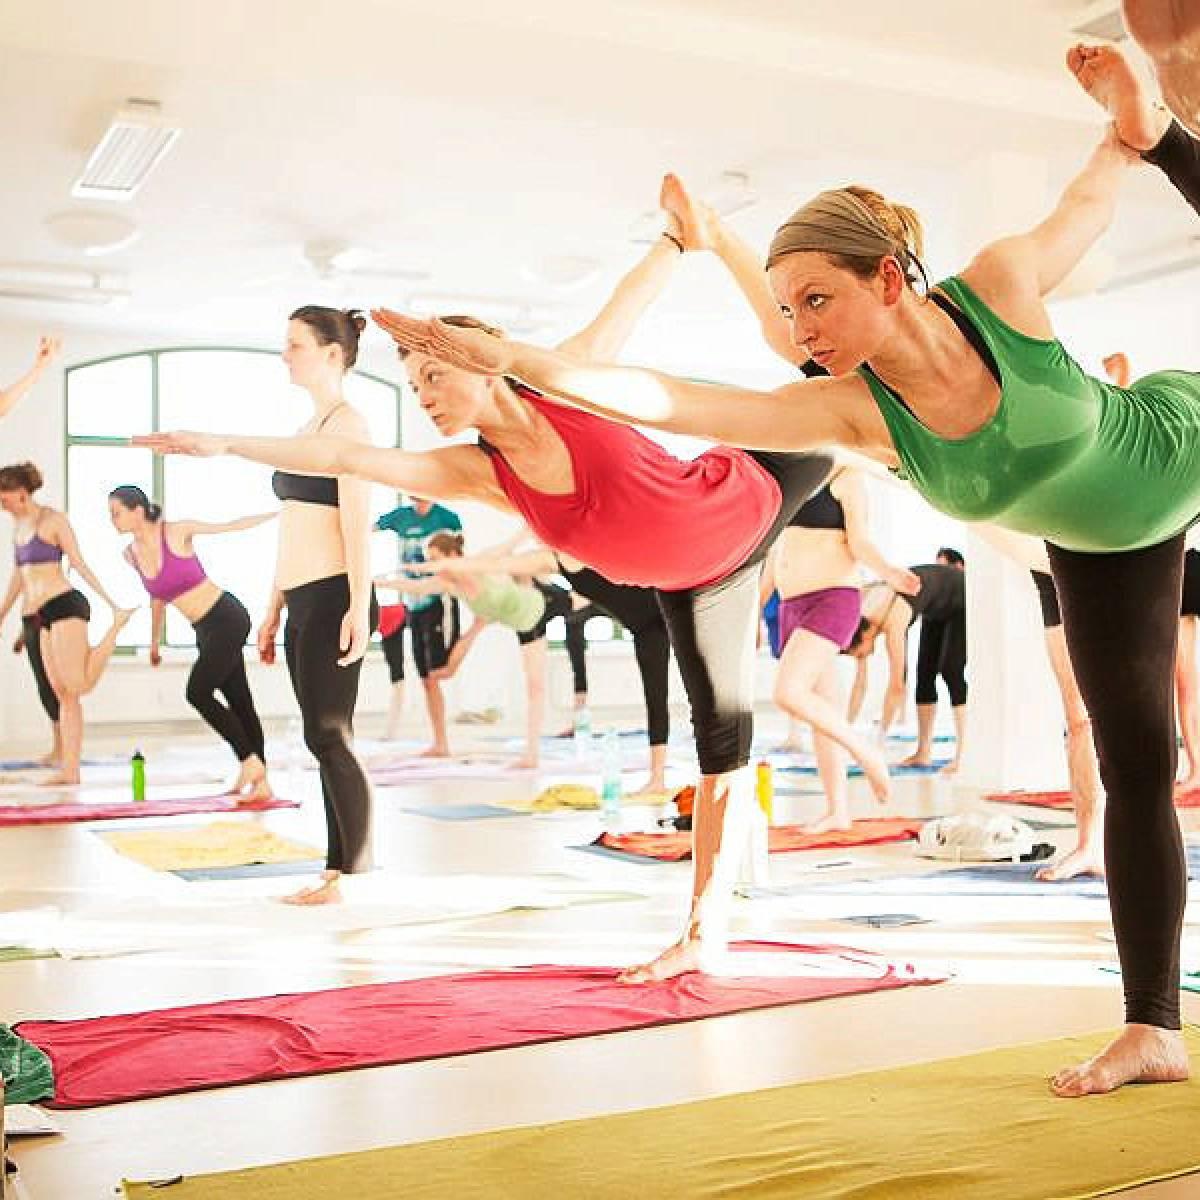 Gericht Yogakurs In Pankow Zahlt Als Bildungsurlaub Berliner Morgenpost